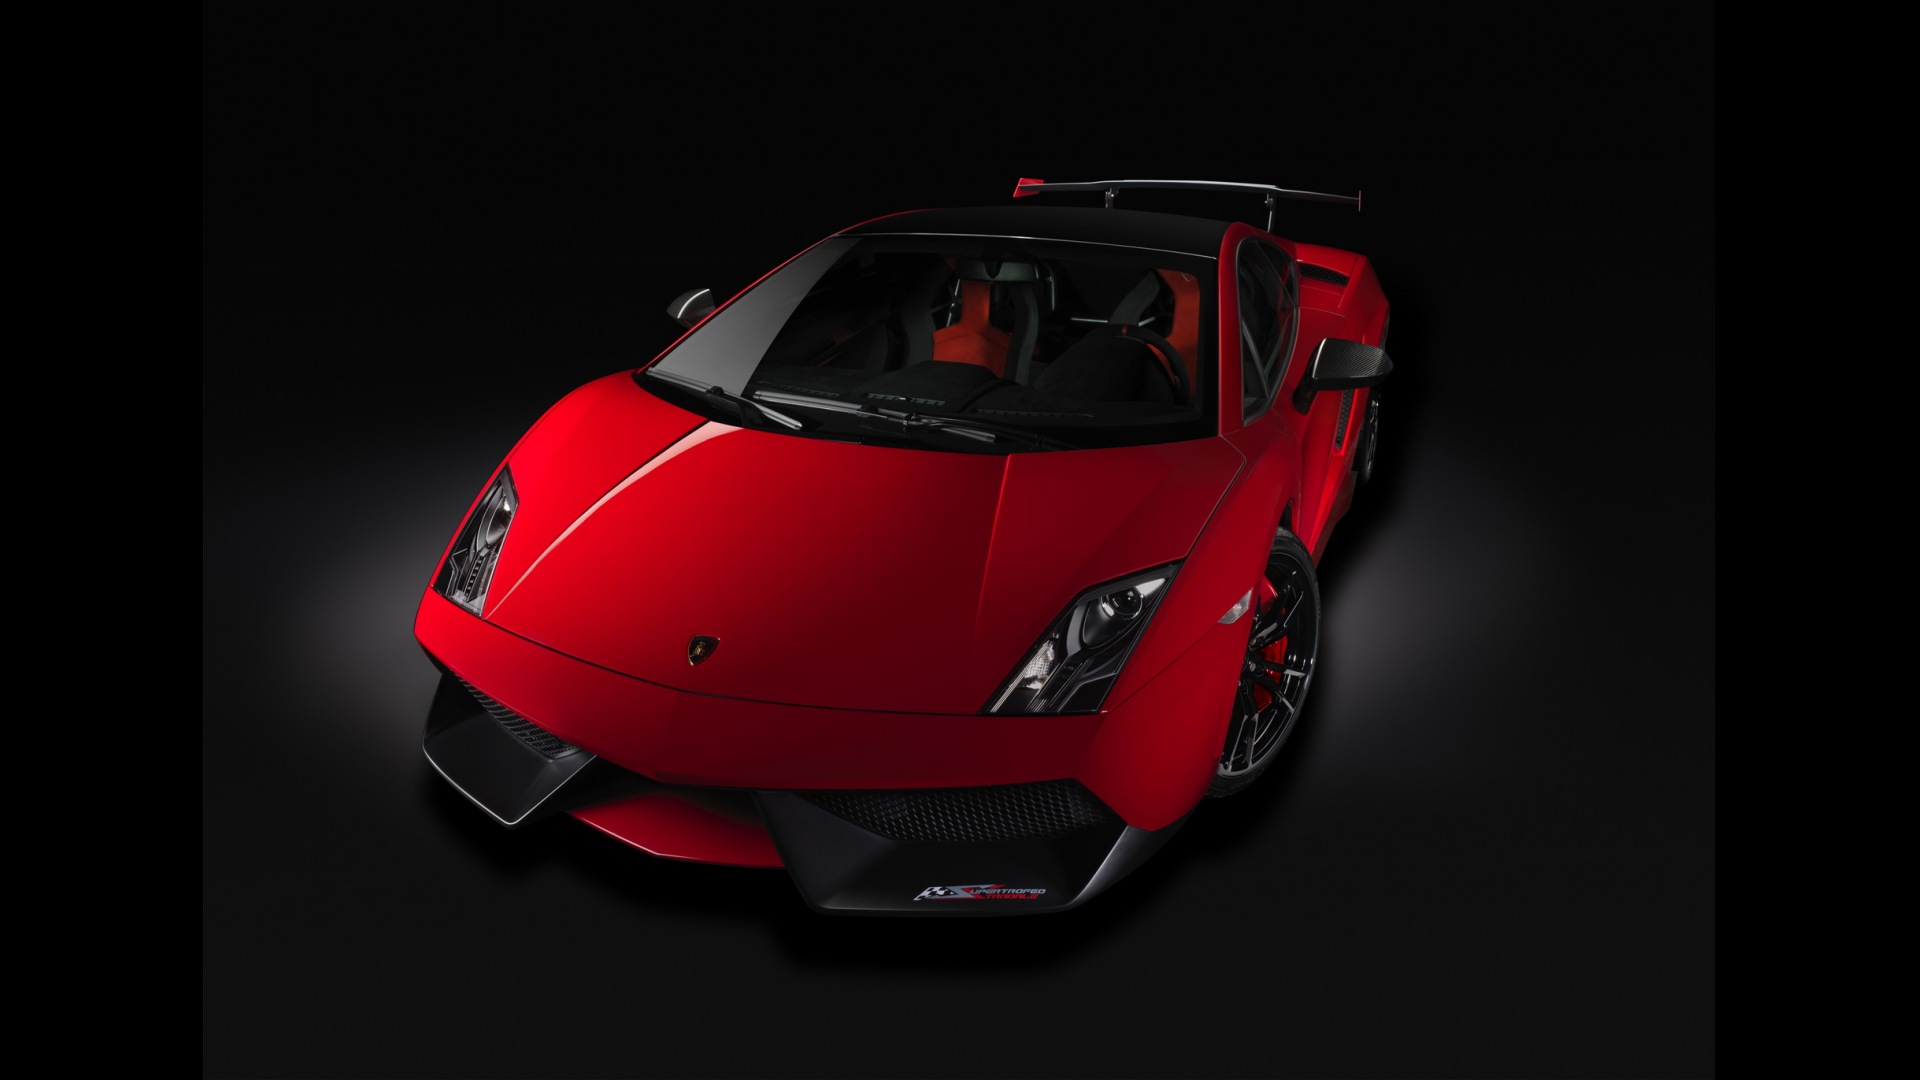 Red And Black Lamborghini Wallpaper 24 Background